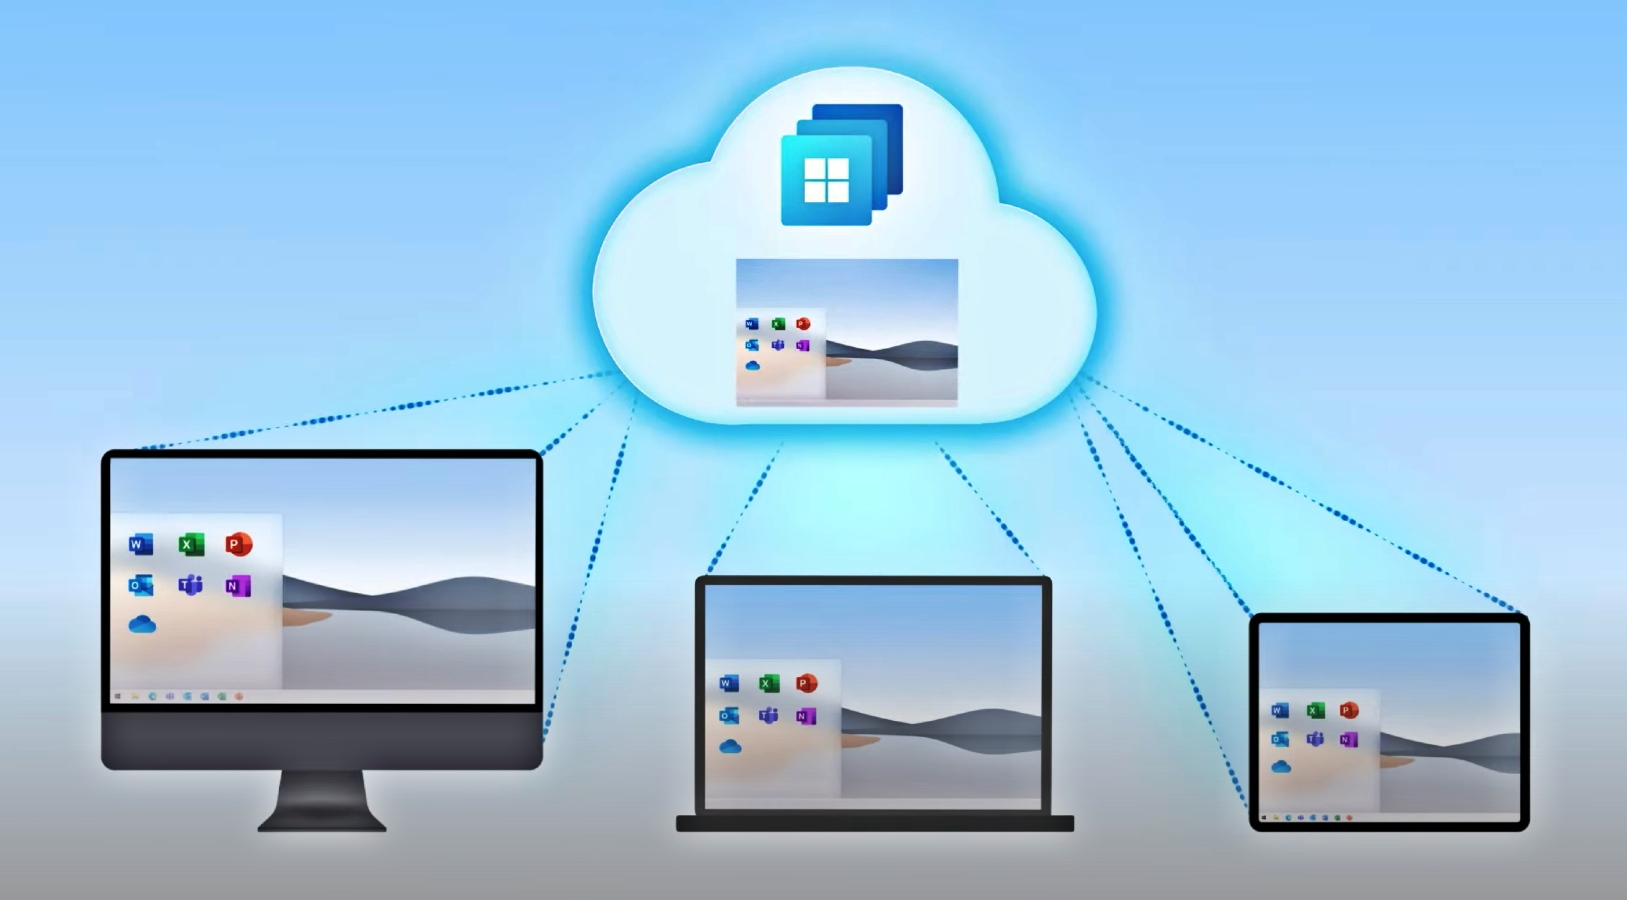 Microsoft shares guidance on securing Windows 365 Cloud PCs